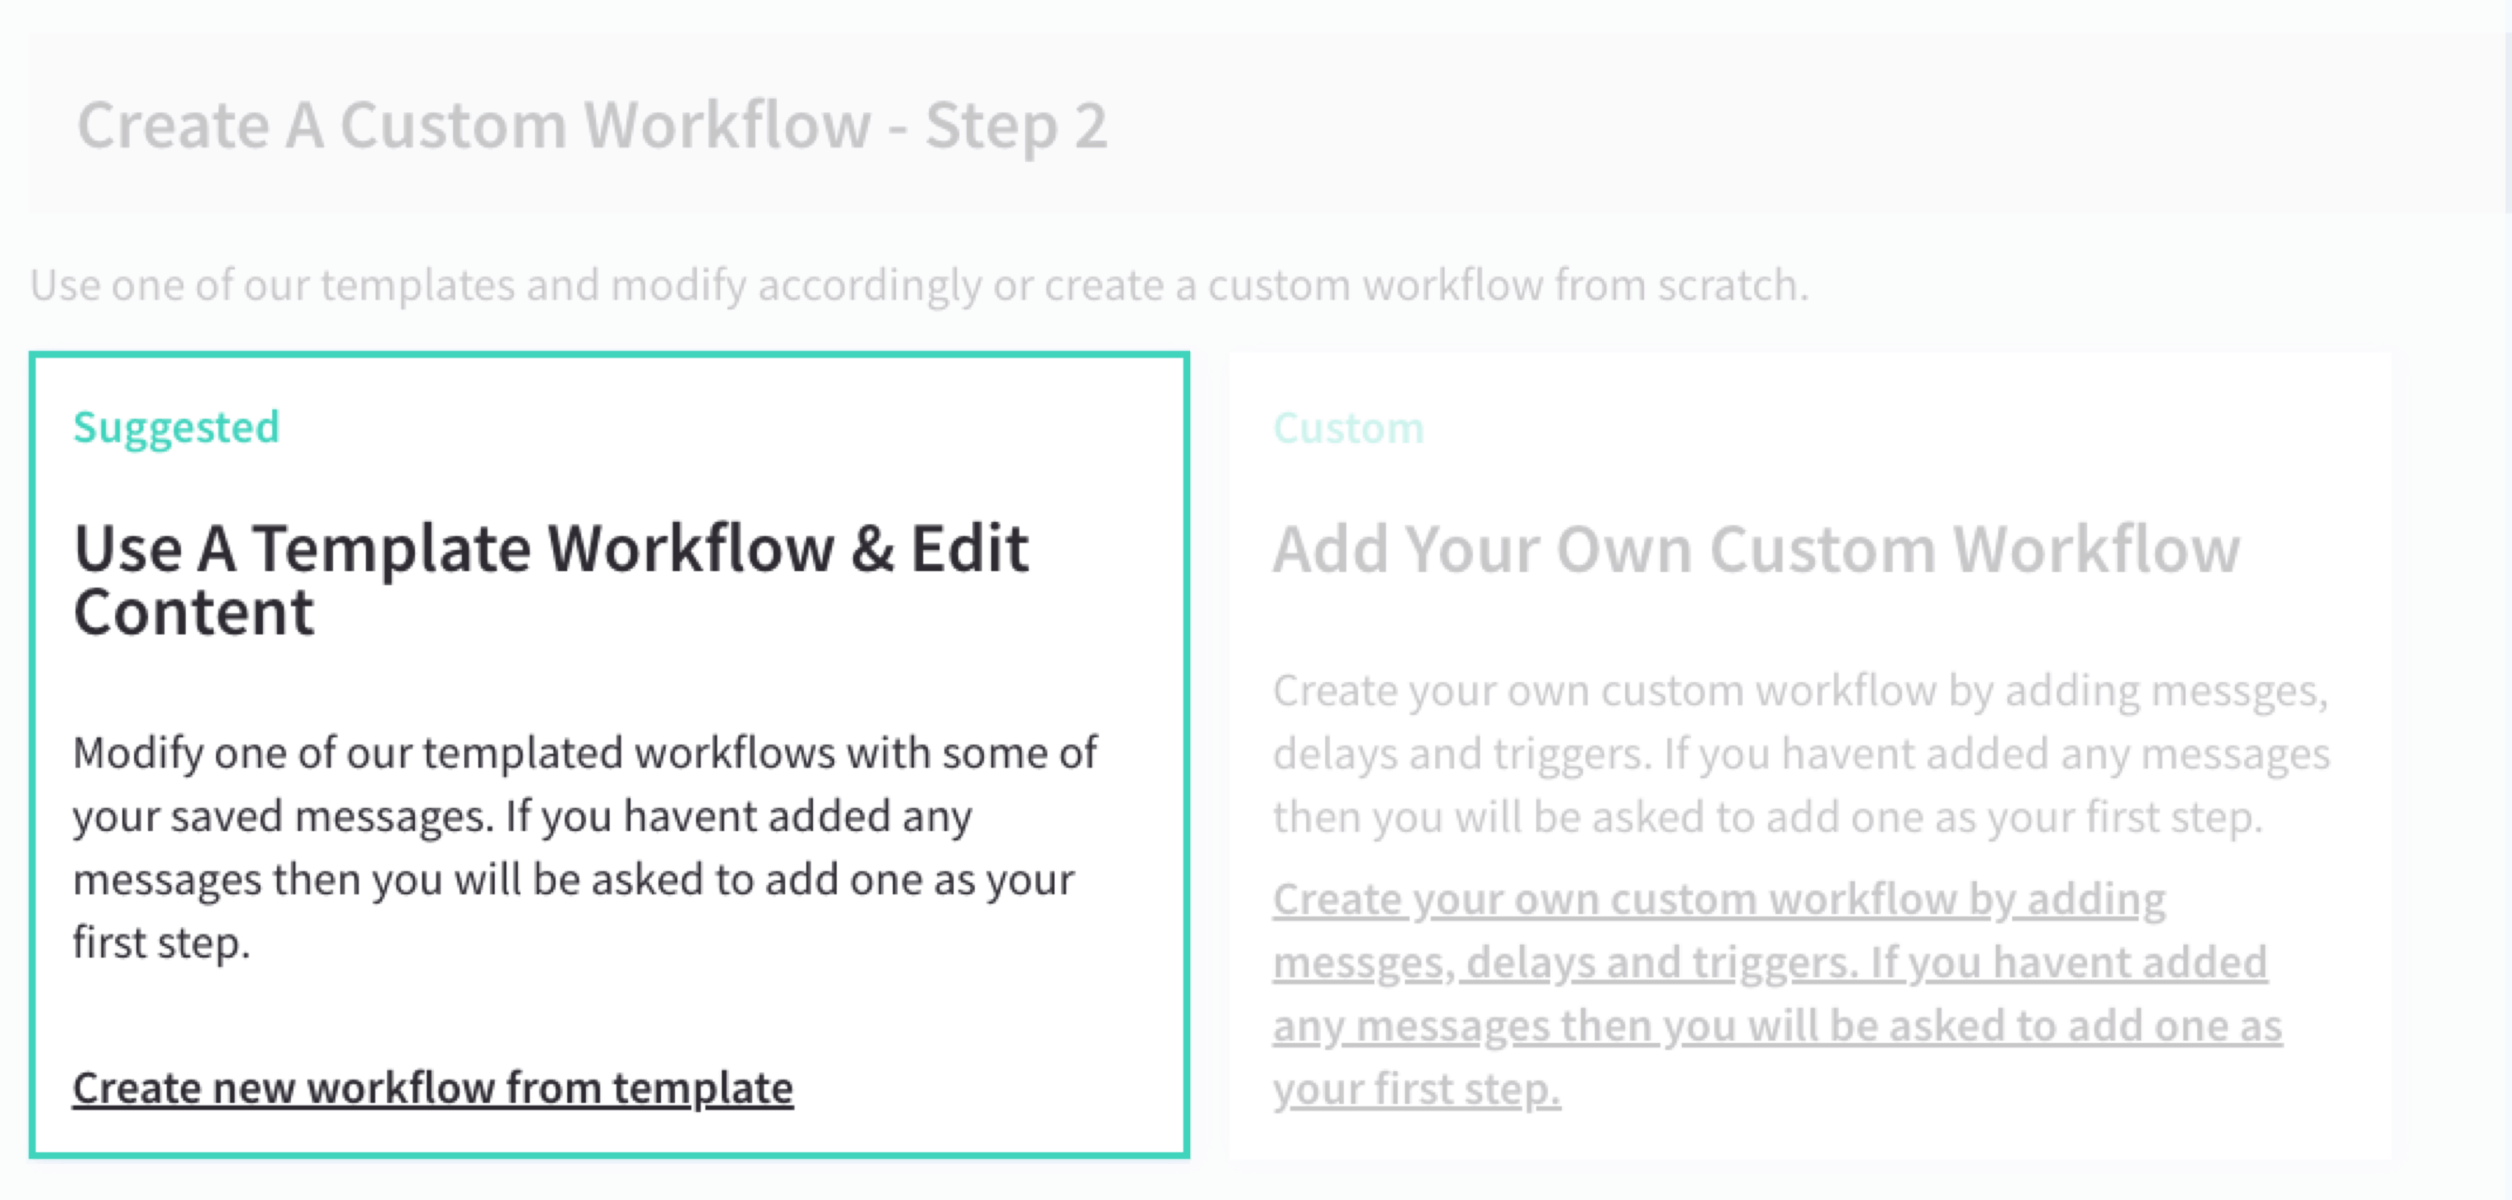 Create A Custom Workflow